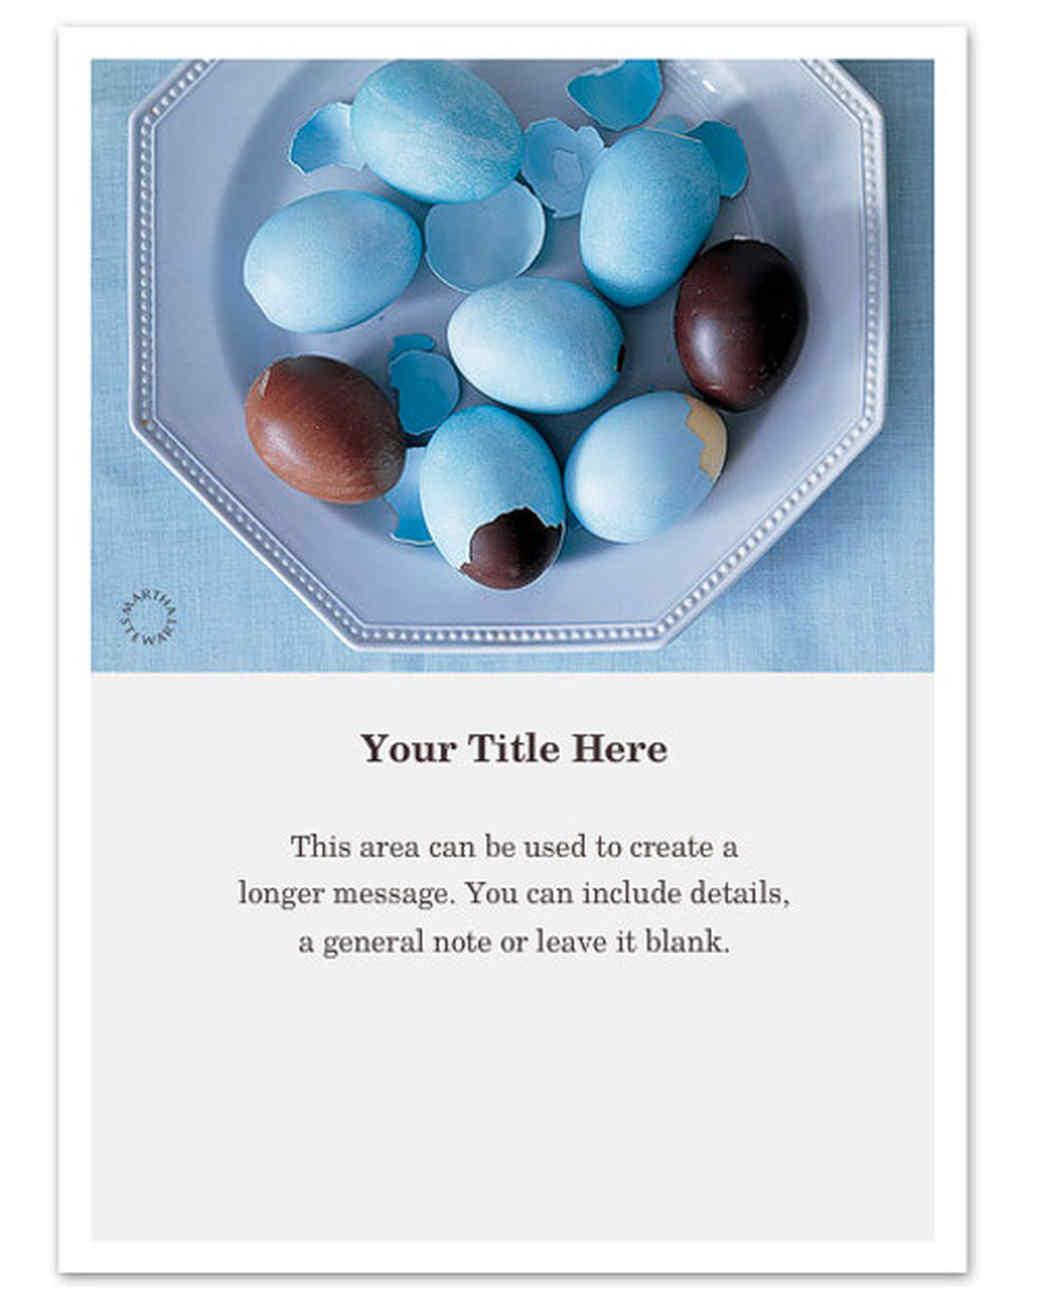 ping_chocolate_eggs.jpg